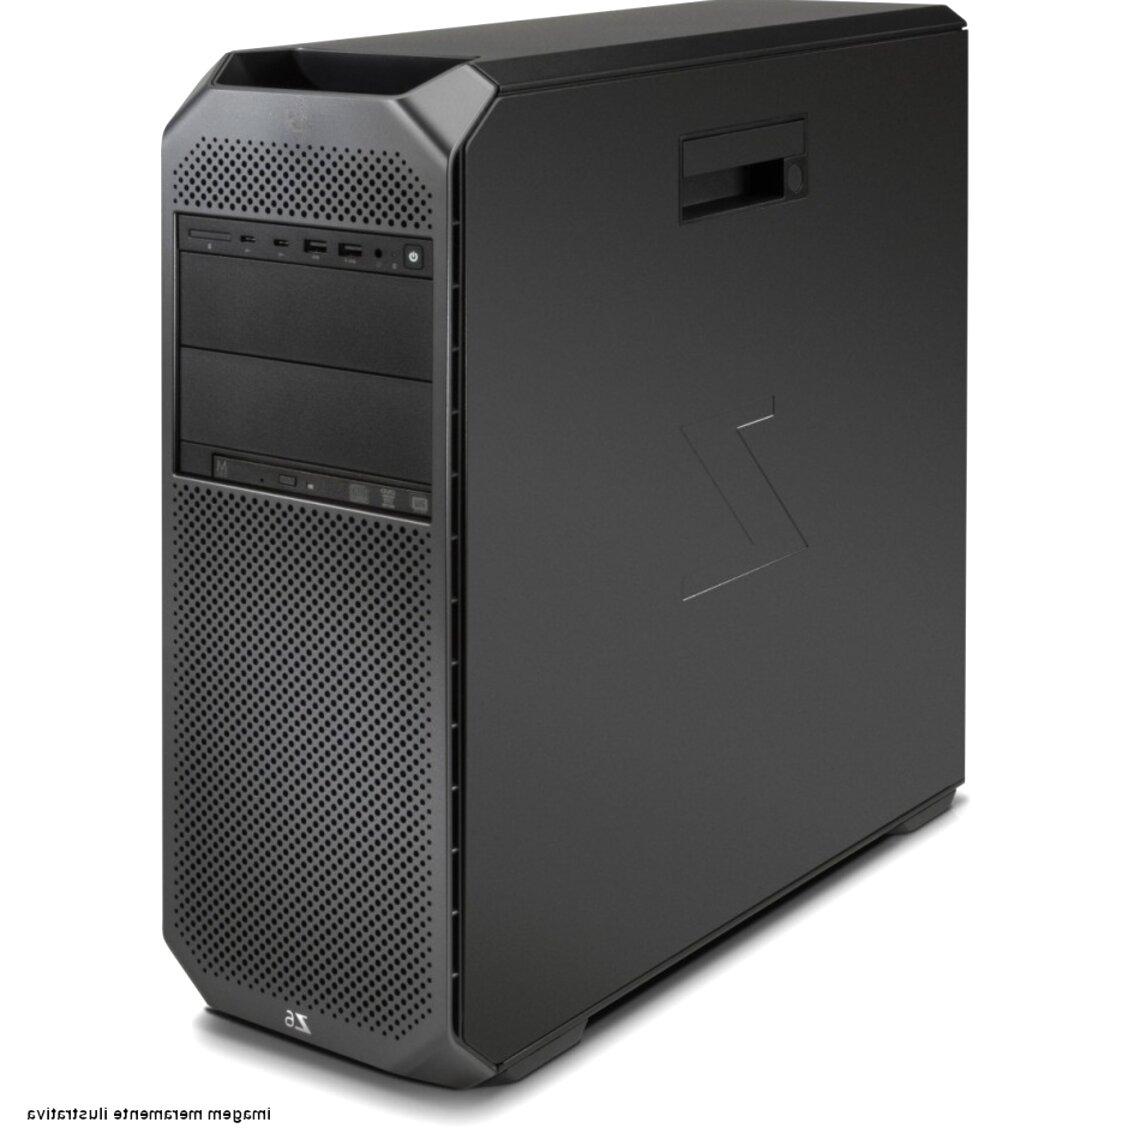 i7 servidor de segunda mano